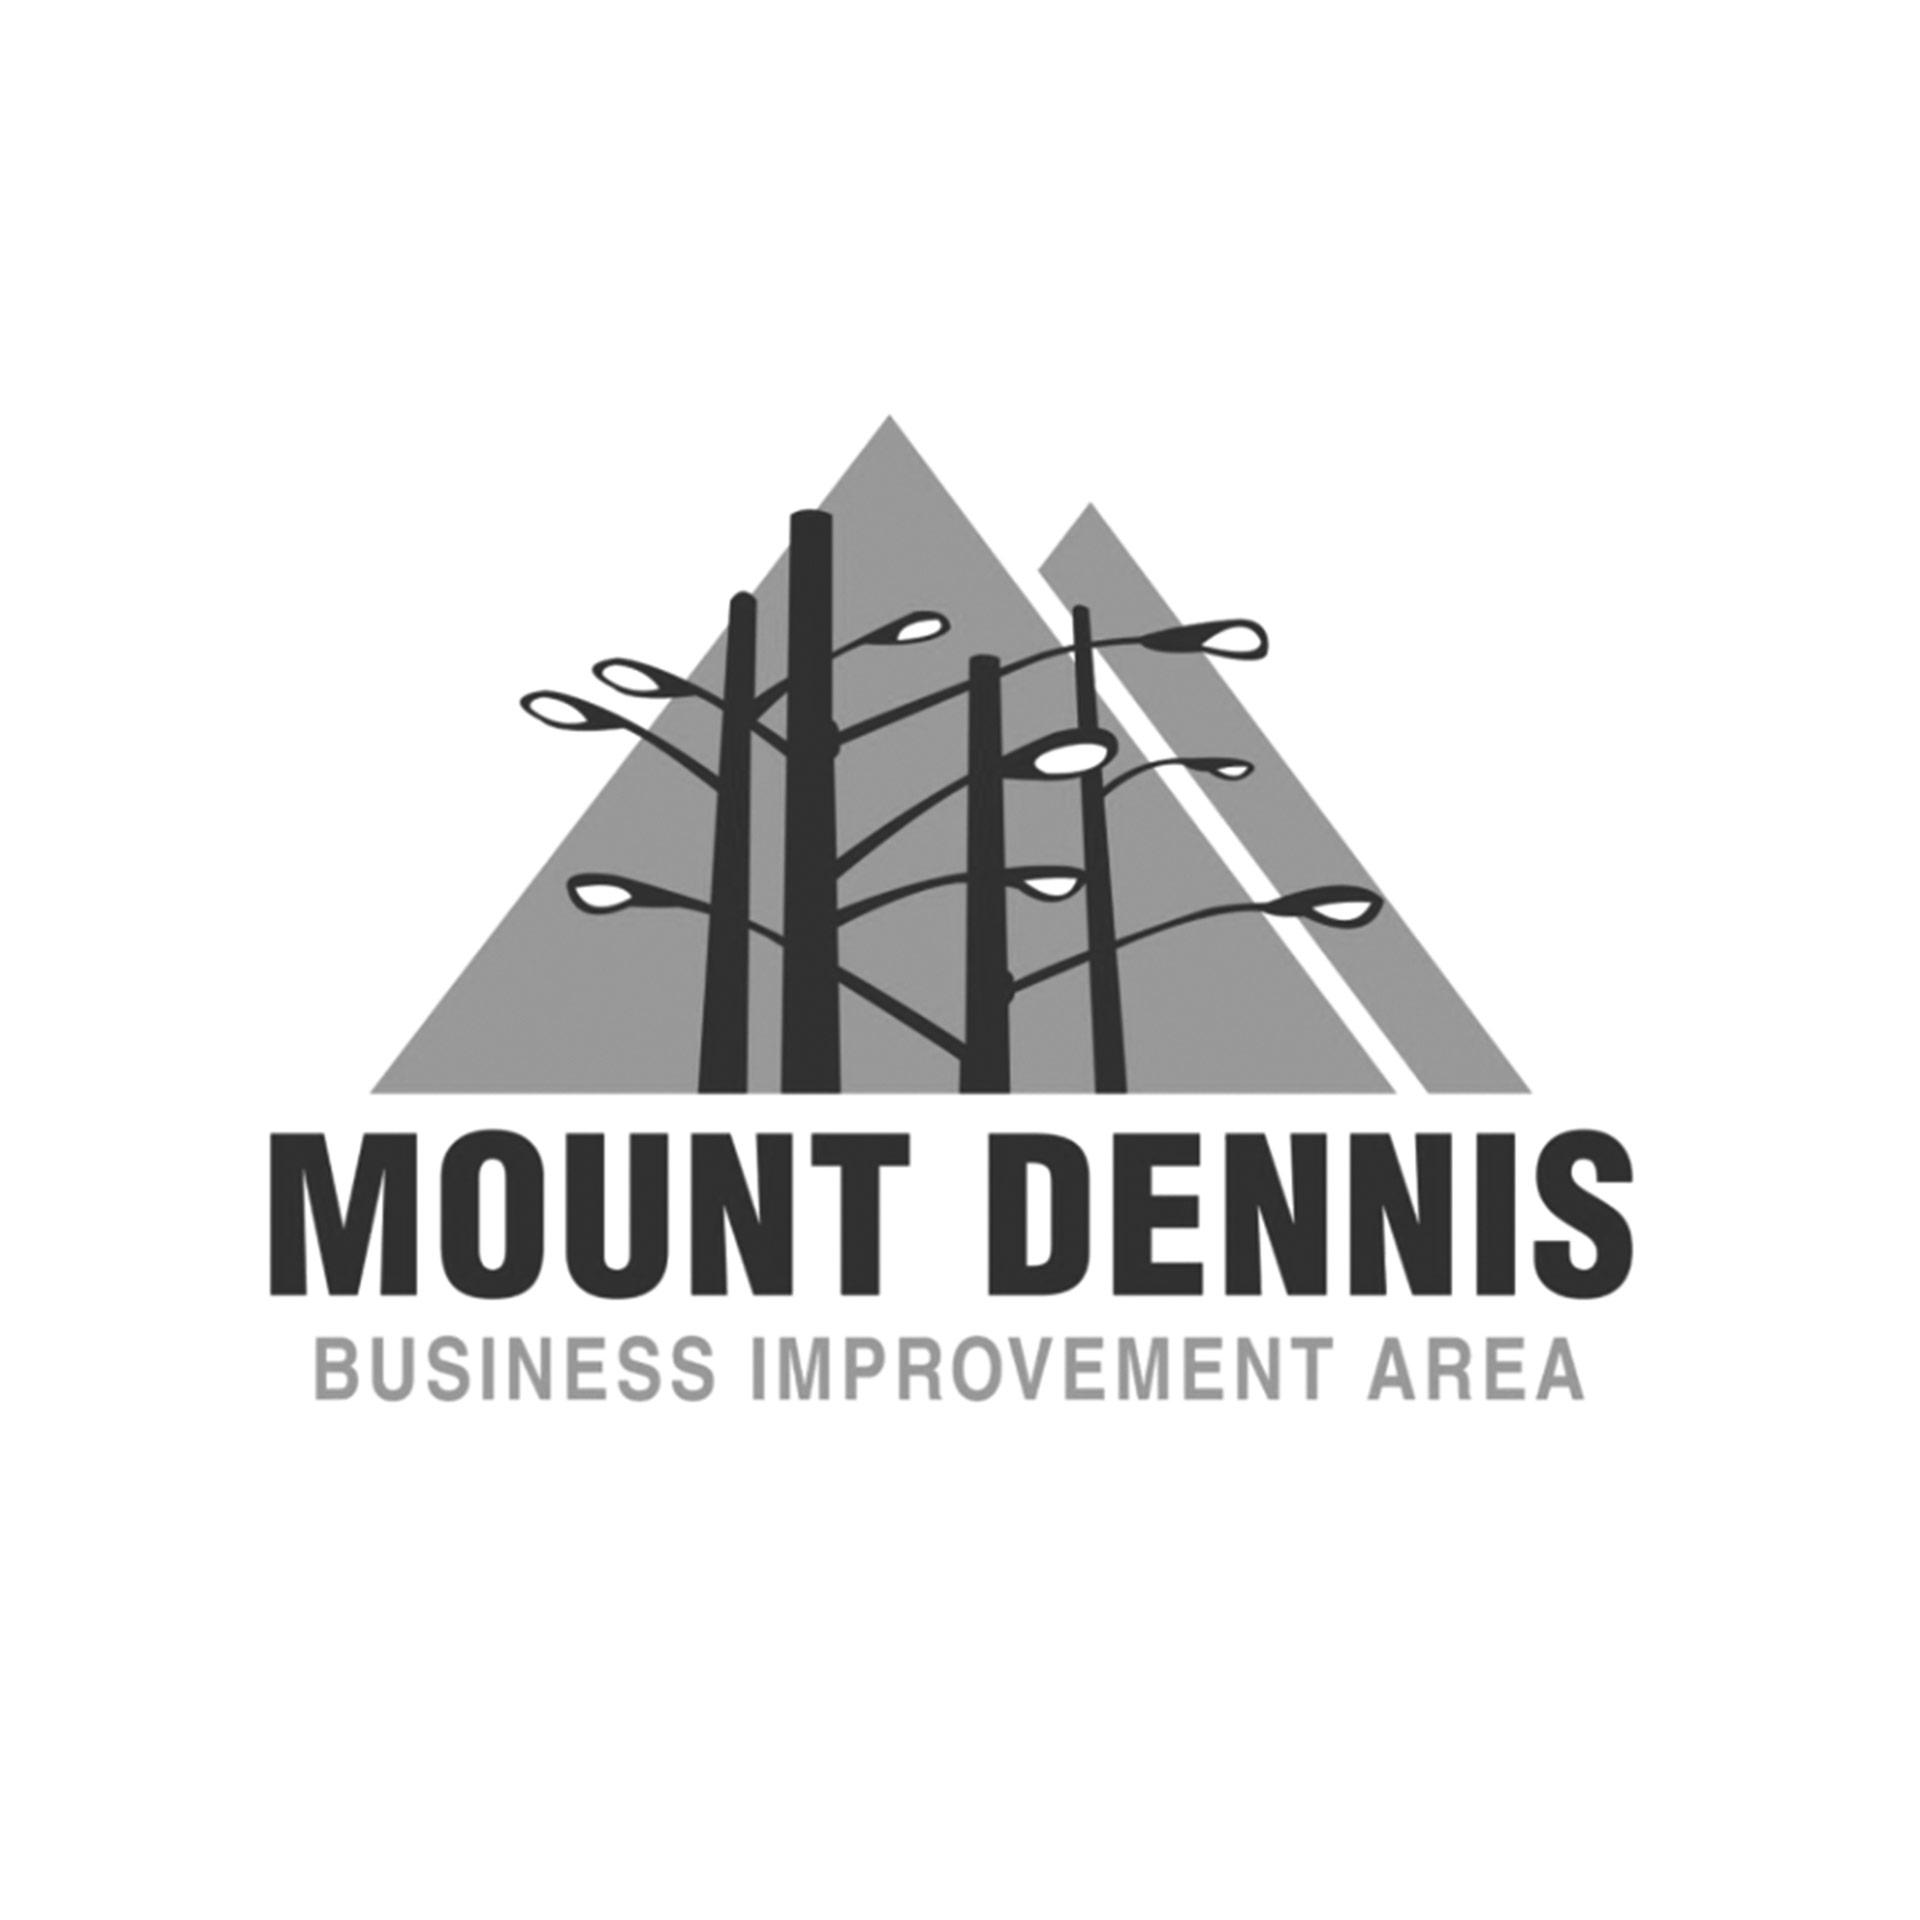 TRANSITioning Mount Dennis